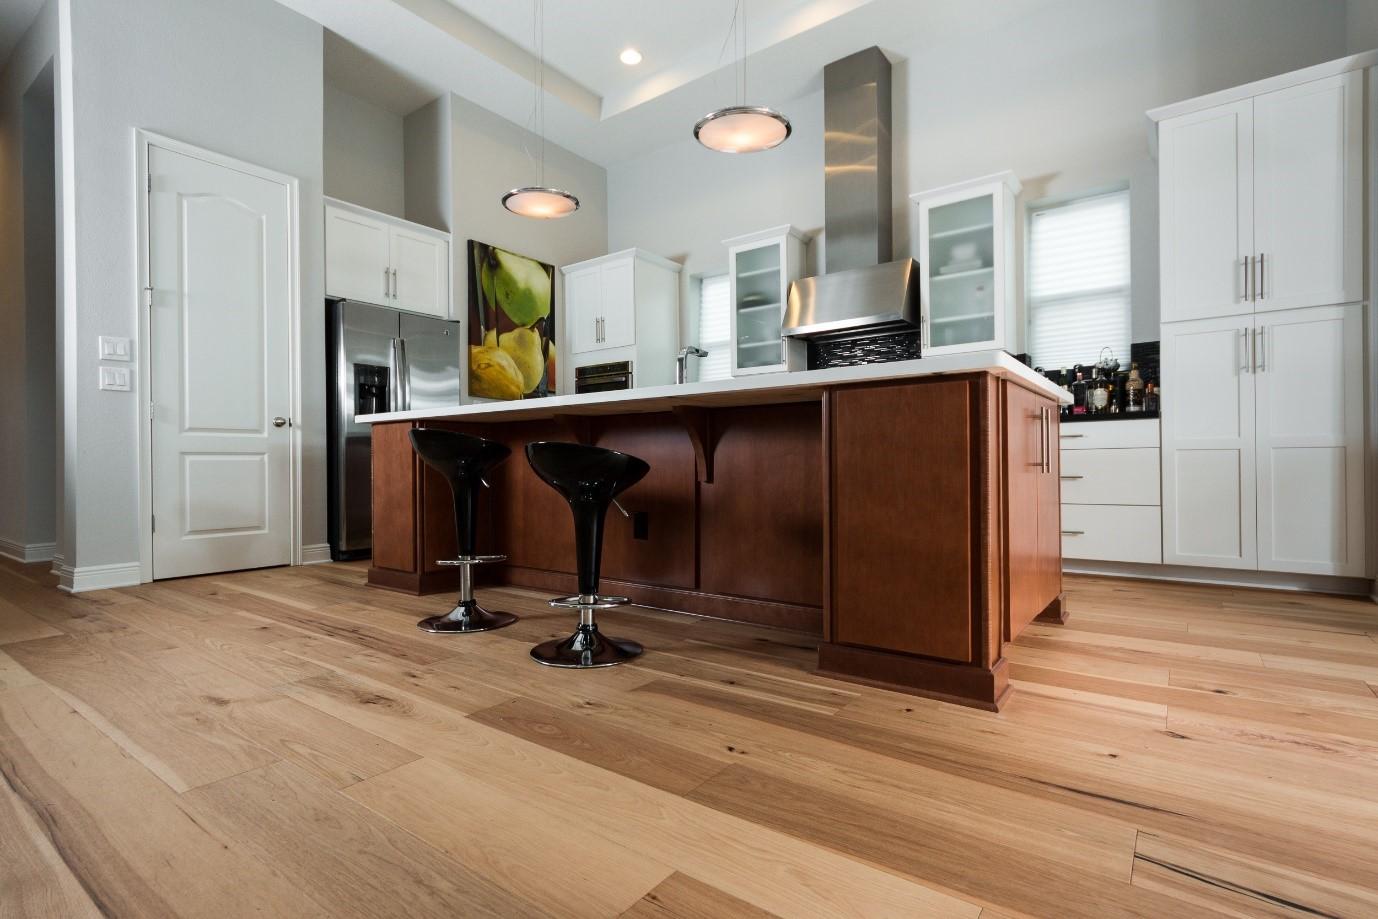 Wire Brushed textured floors - Taskmasters